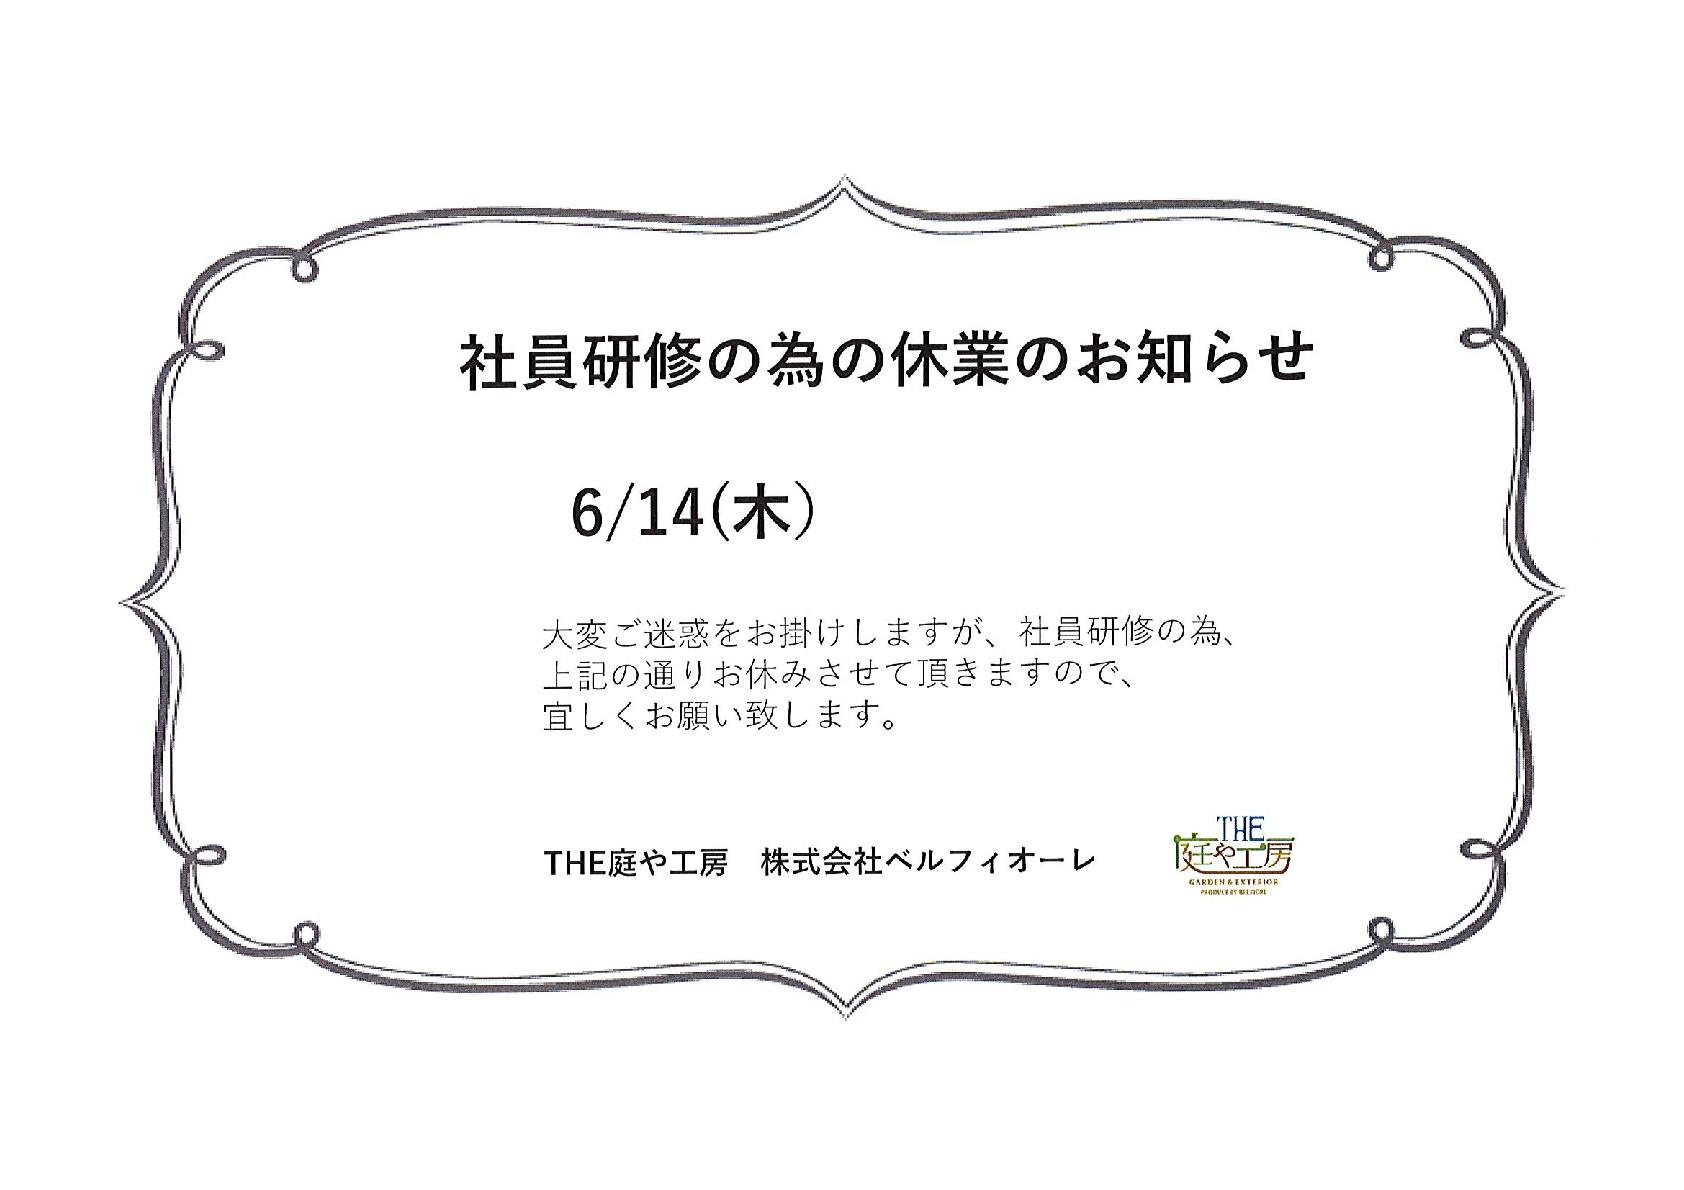 DOC180530-20180530102325-001 (1)